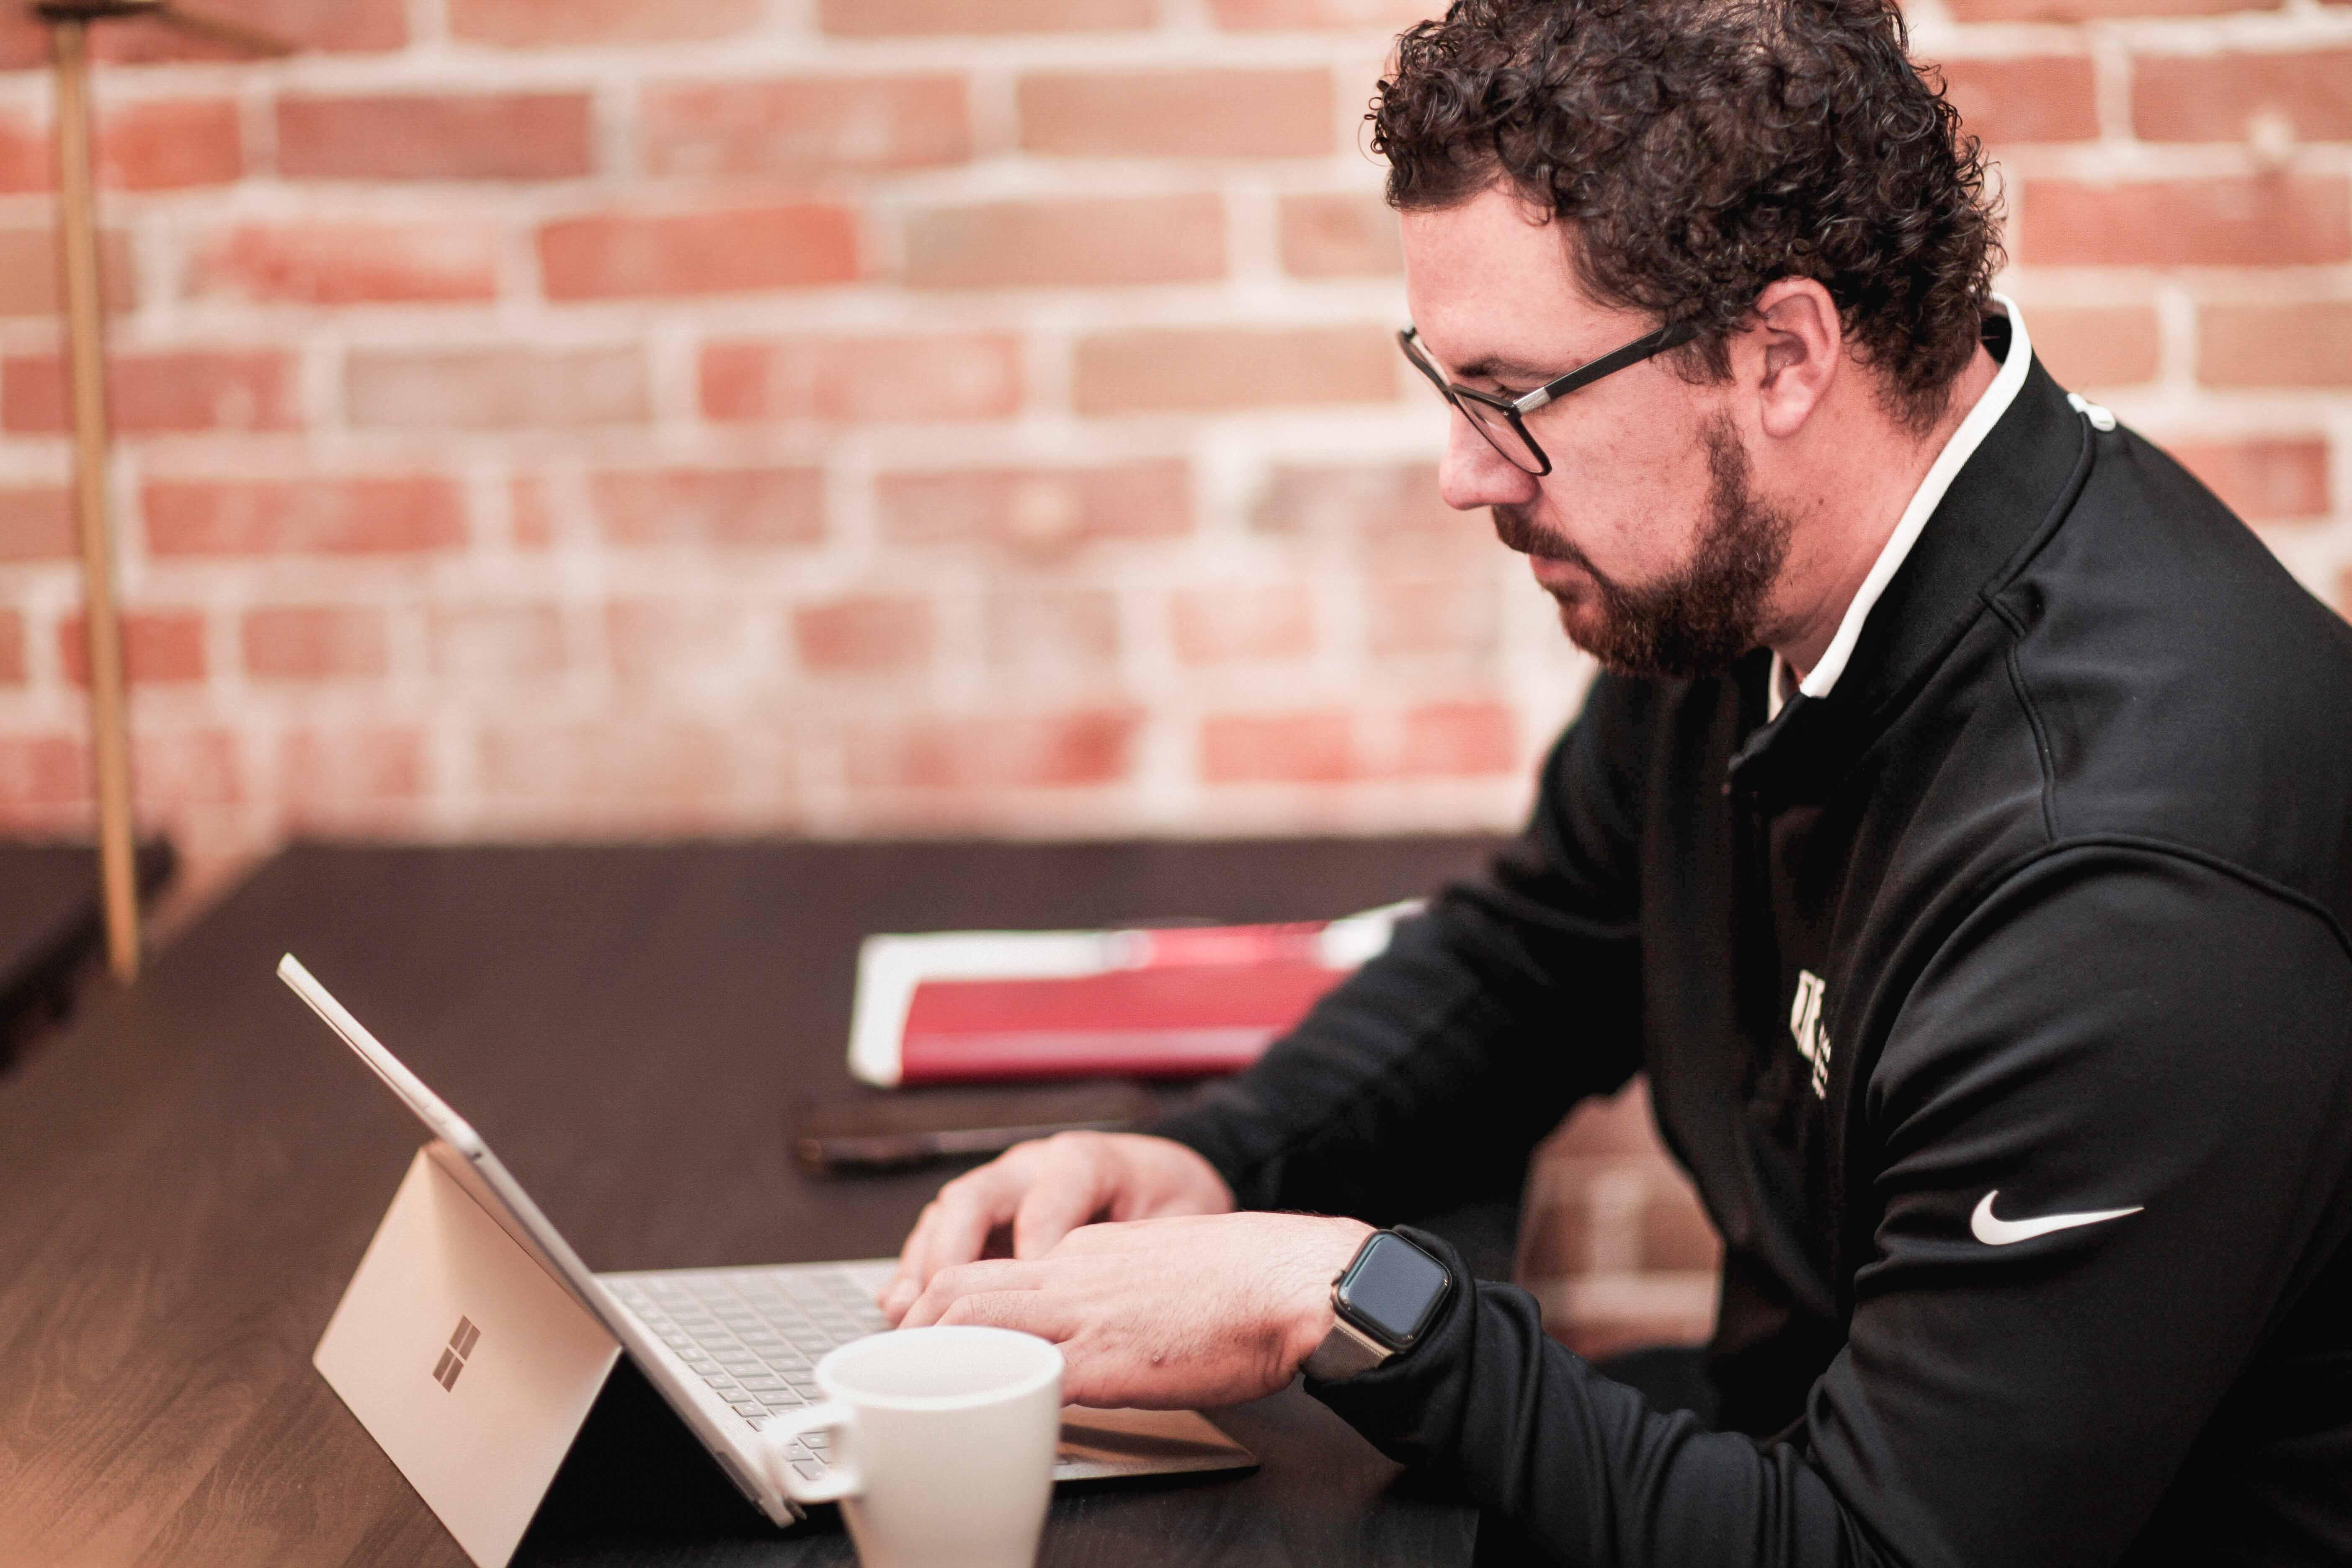 Man sitting at desk typing on a laptop